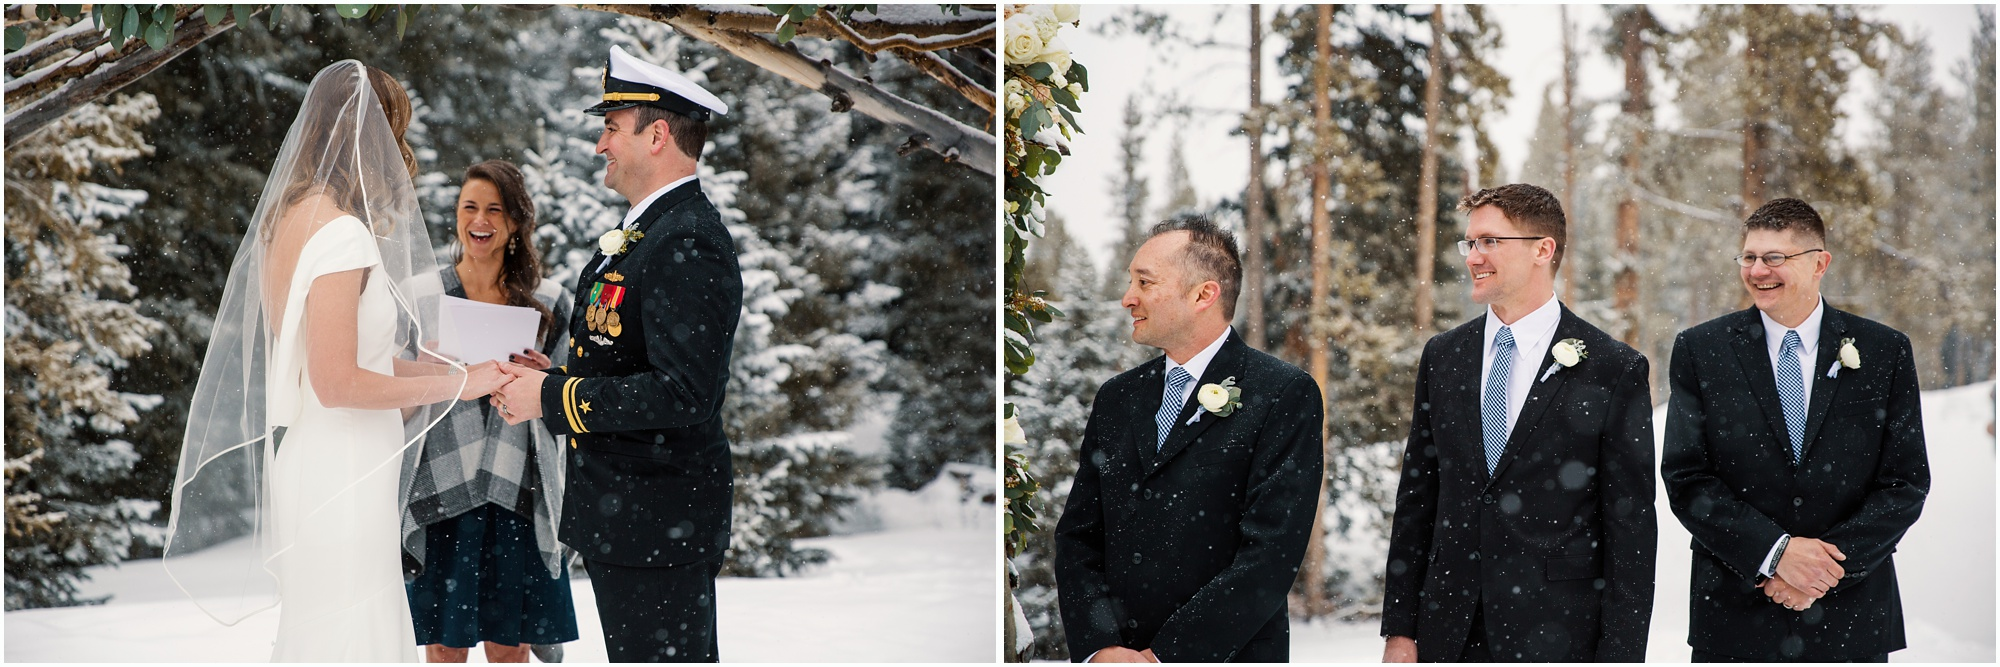 Breckenridge-Wedding-Photographer_0037.jpg